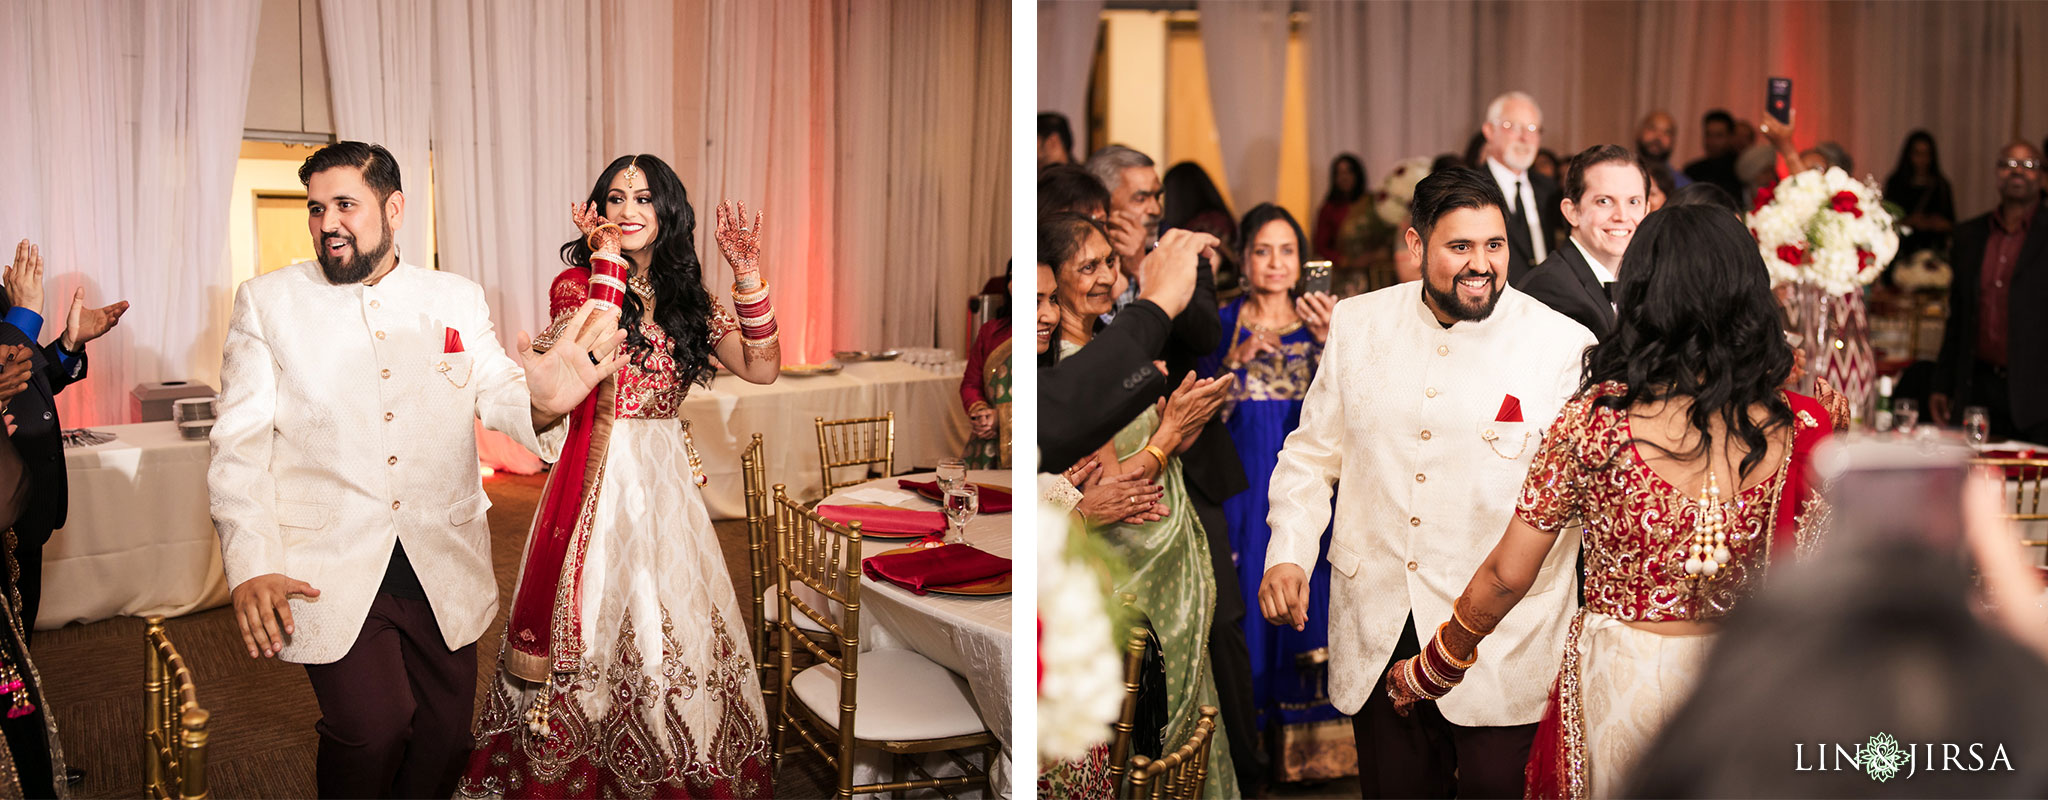 30 Diamond Bar Center Inland Empire Indian Wedding Photography